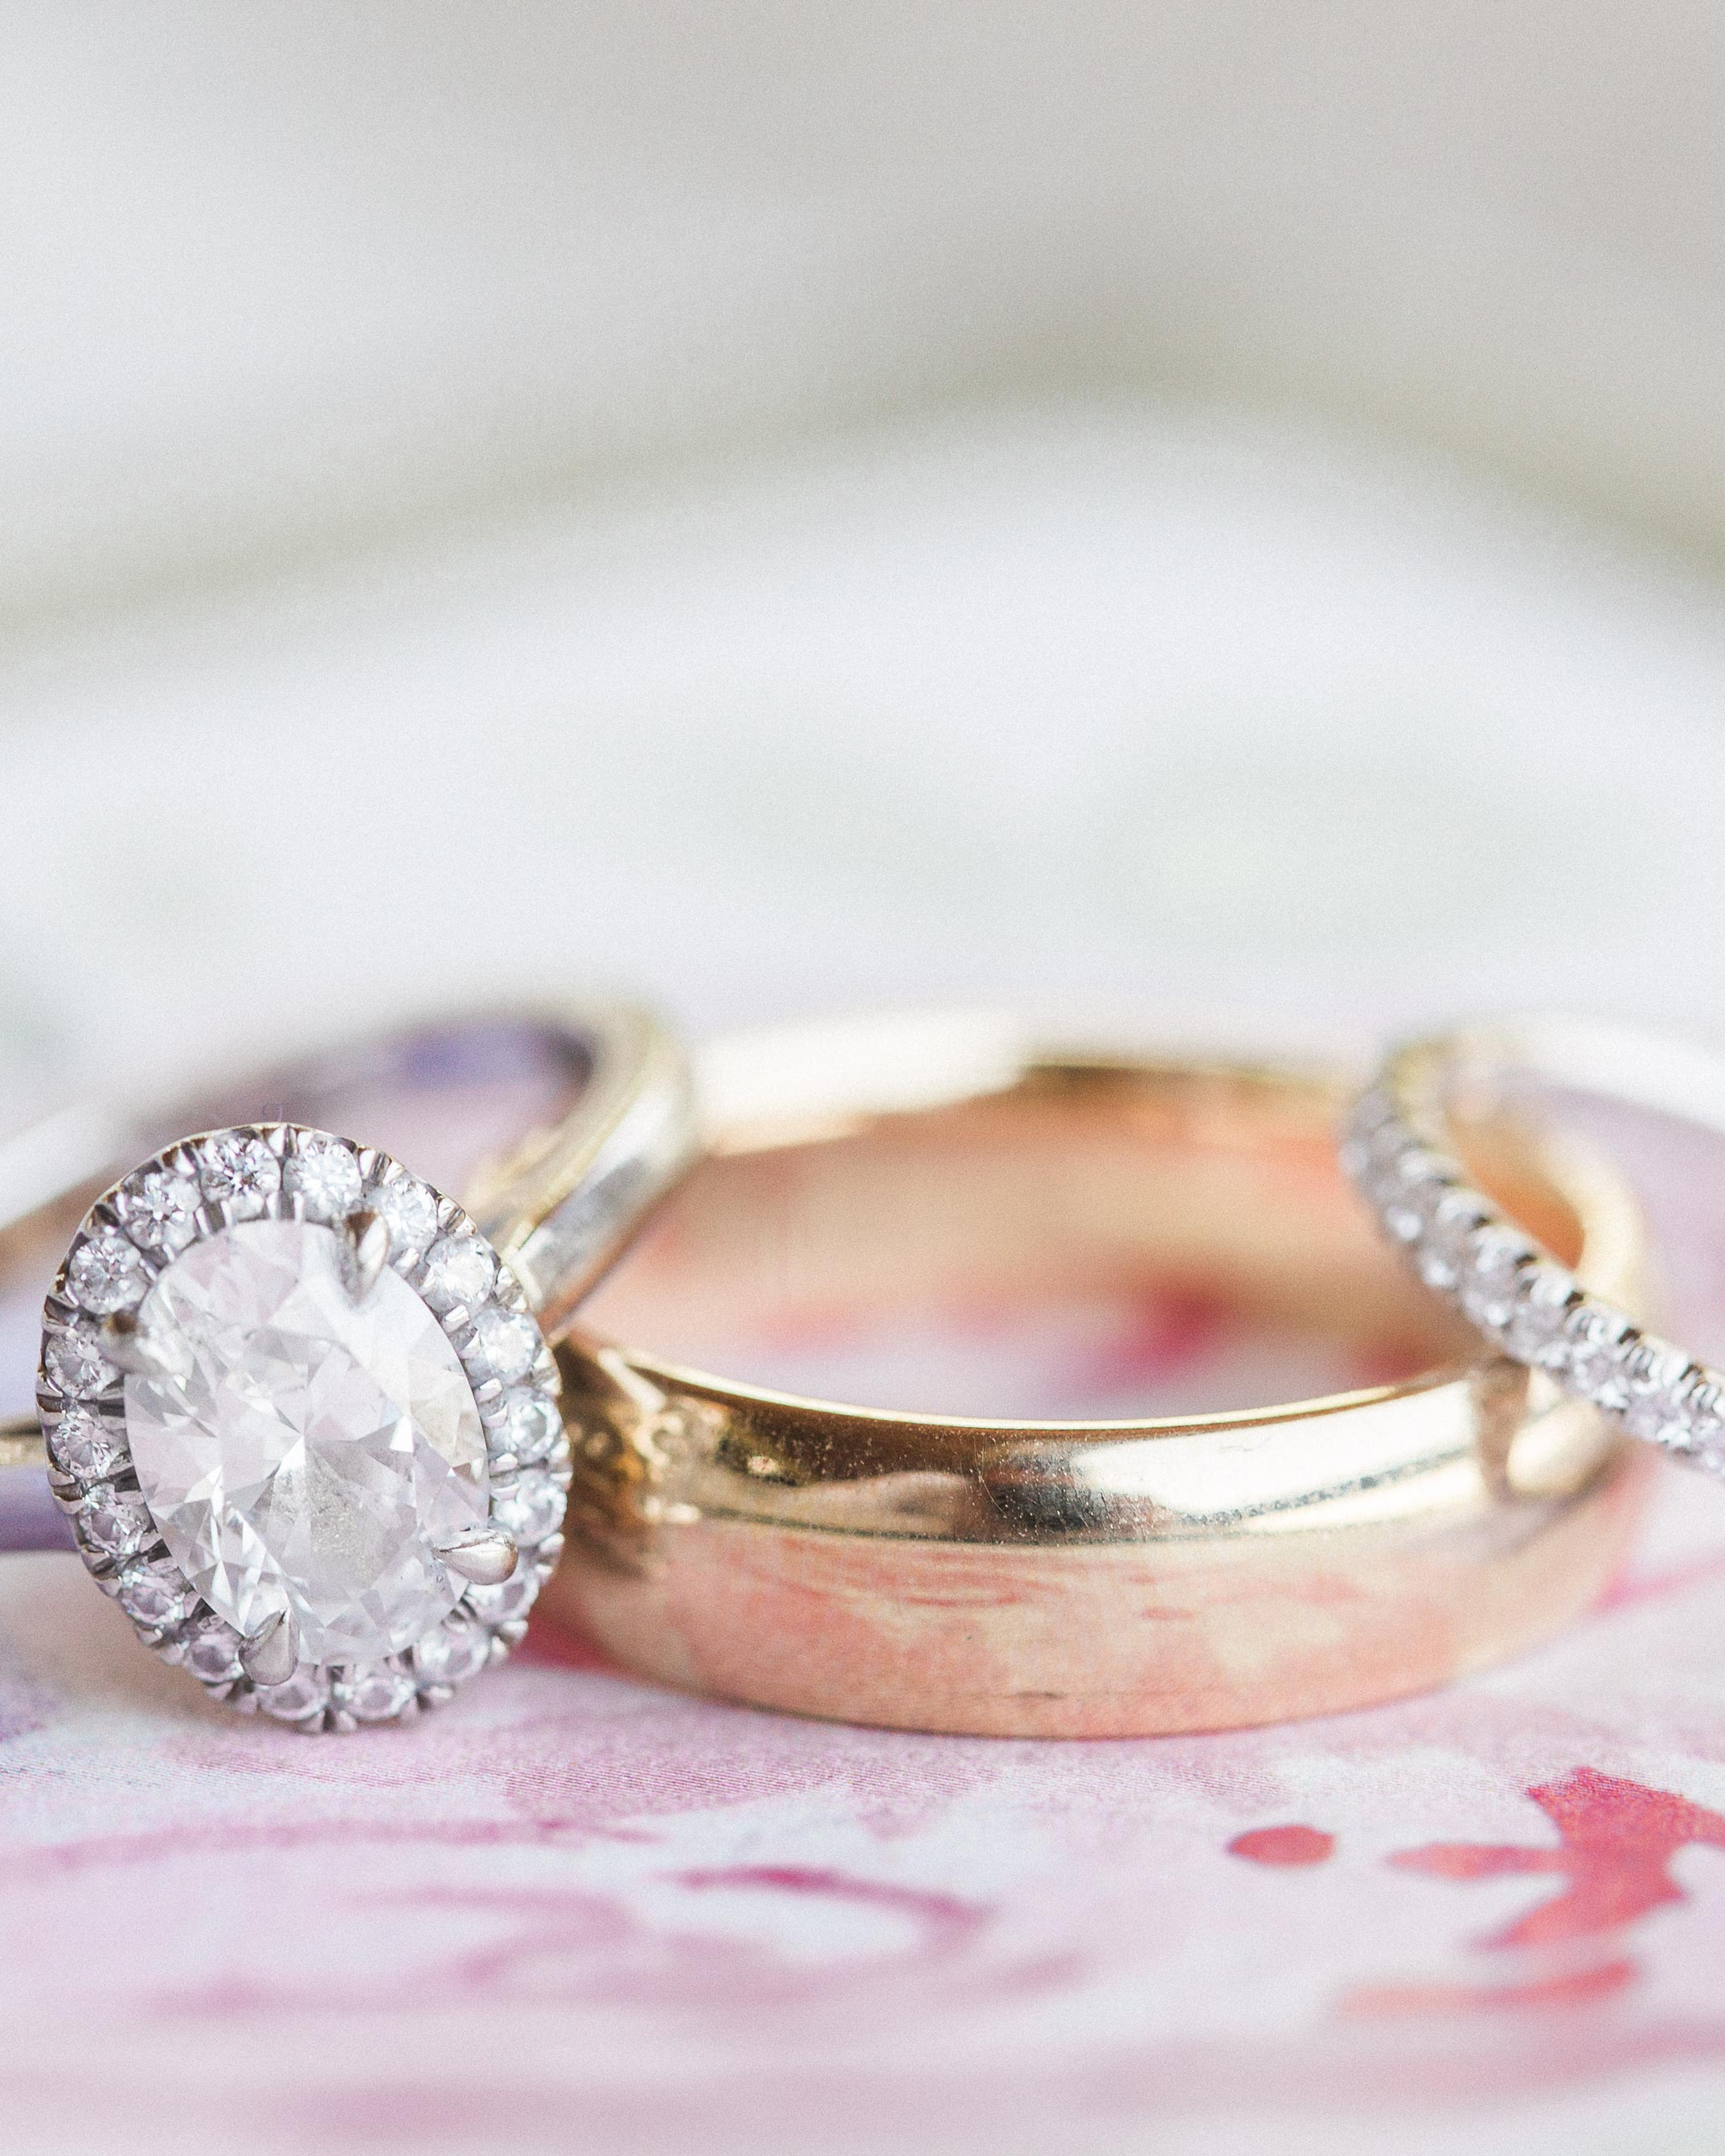 sarah-michael-wedding-rings-18-s112783-0416.jpg